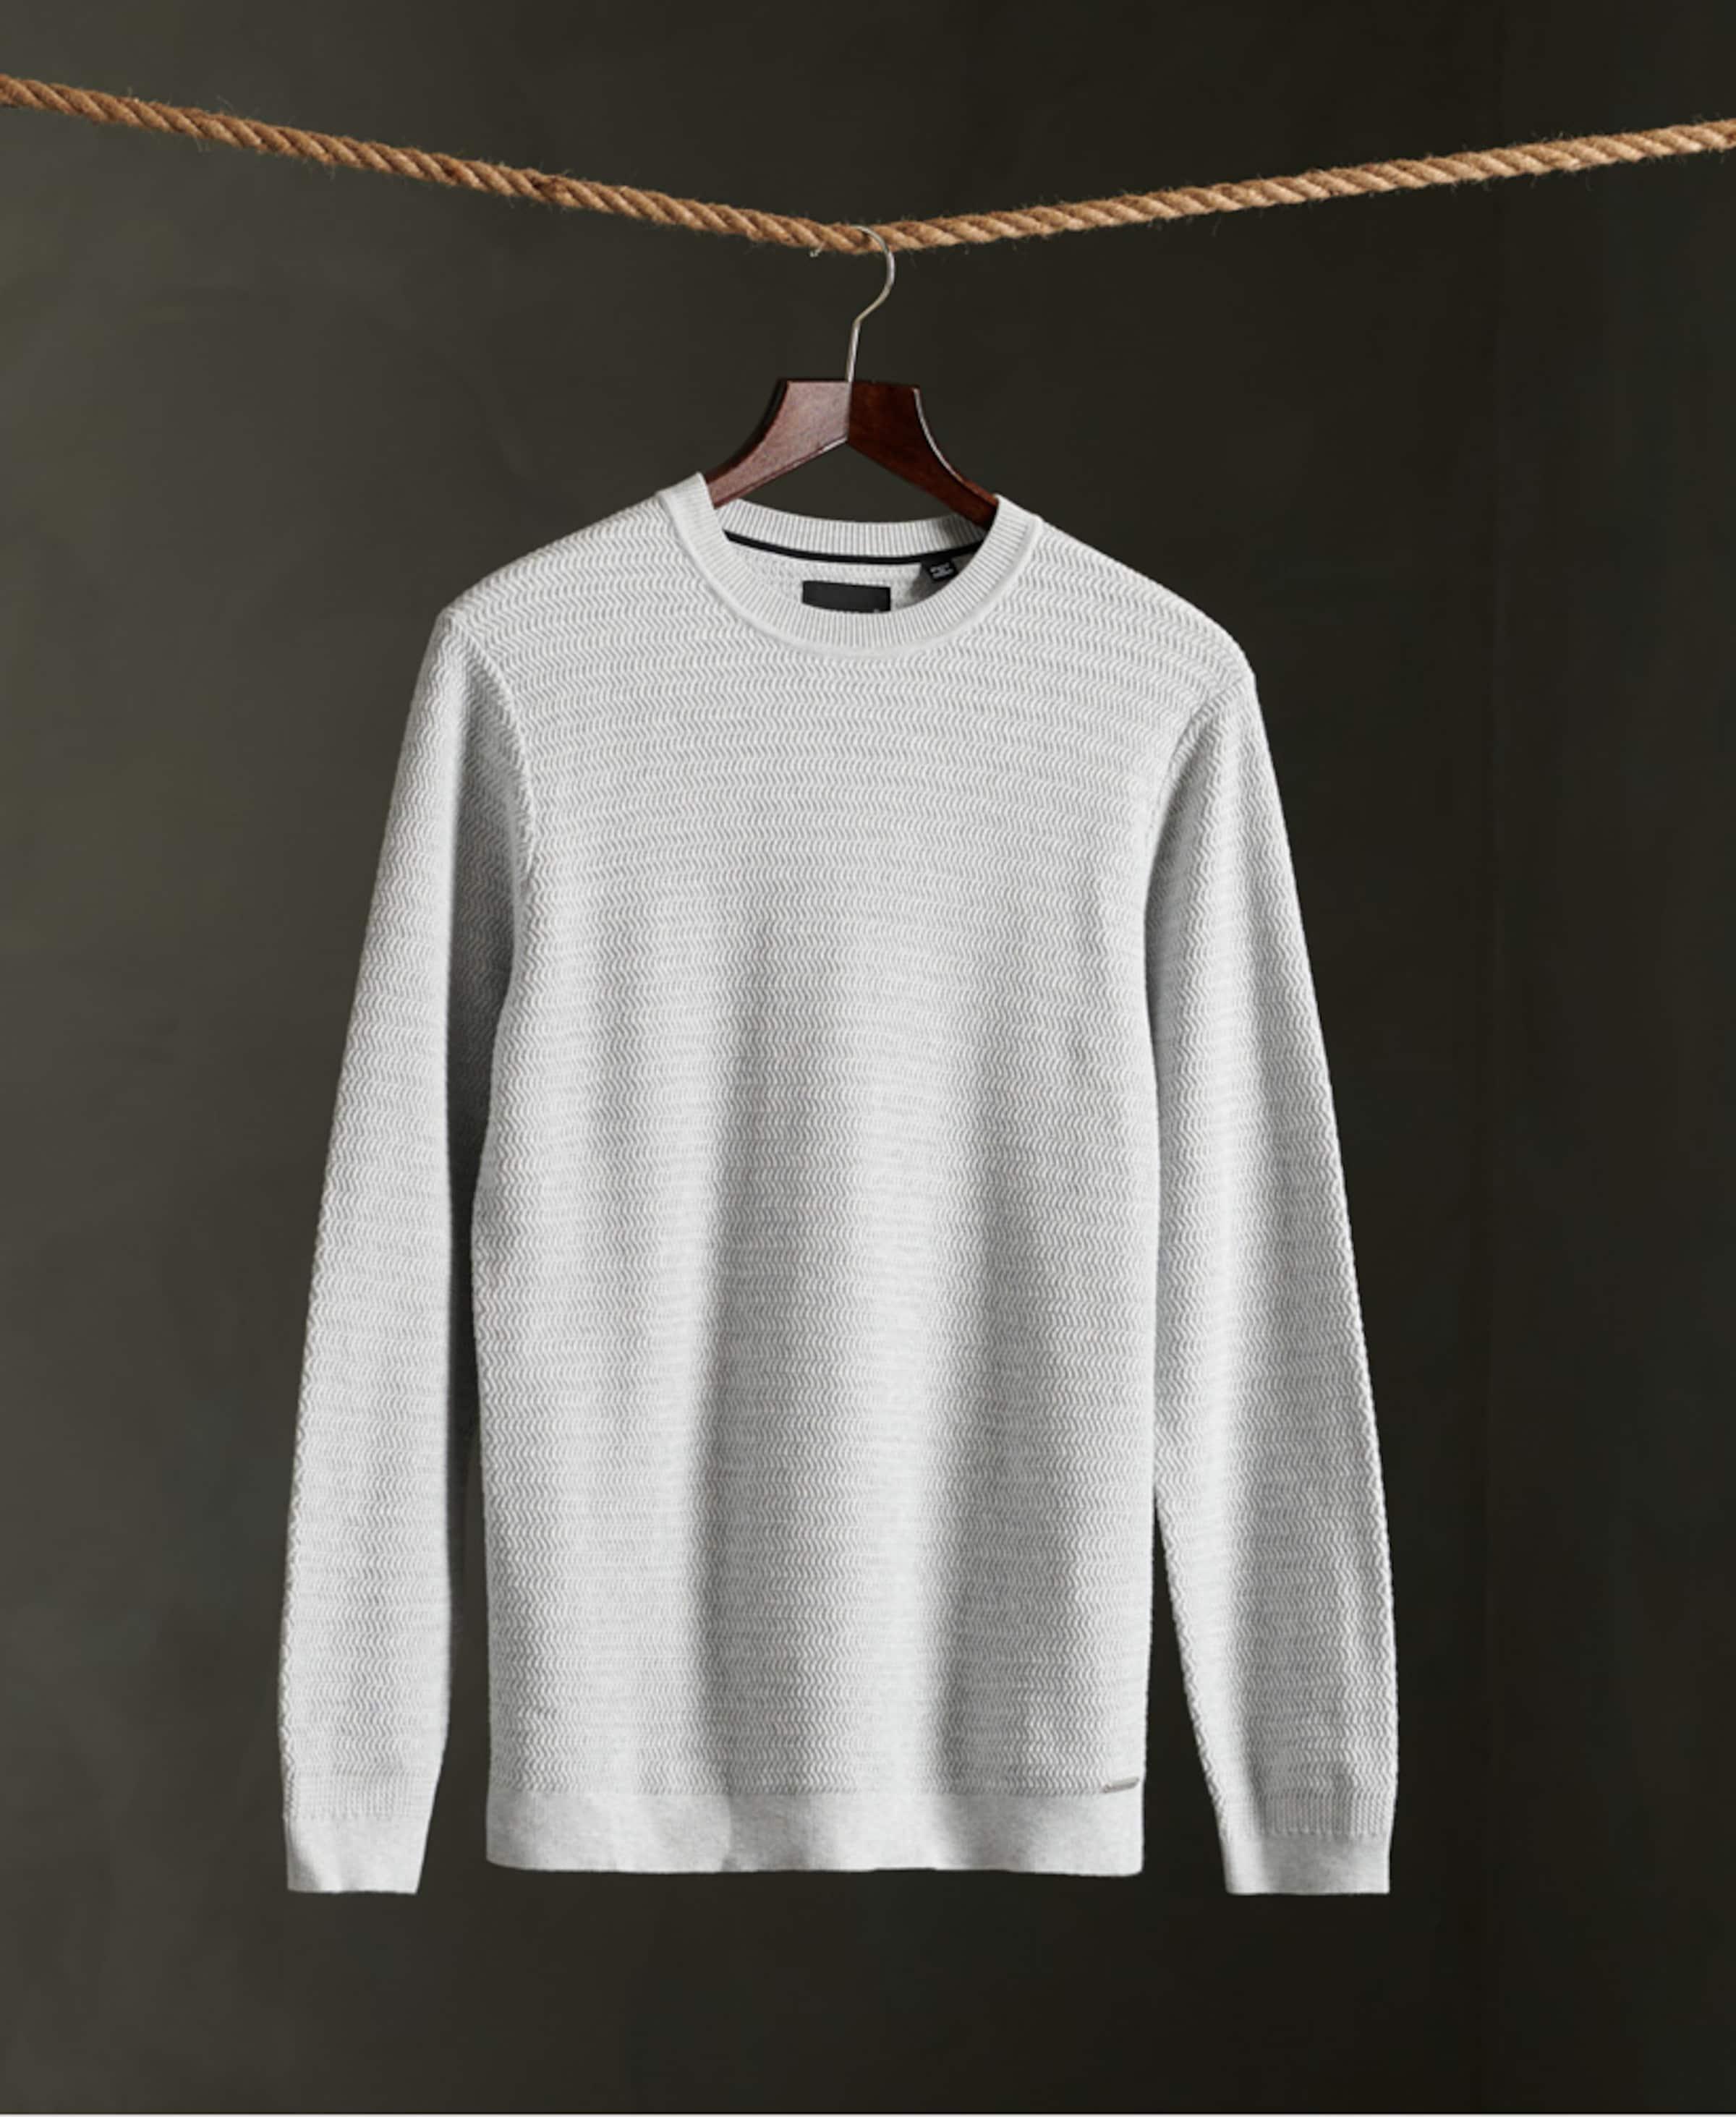 Superdry Pullover in grau Unifarben 1041411500508U7U001